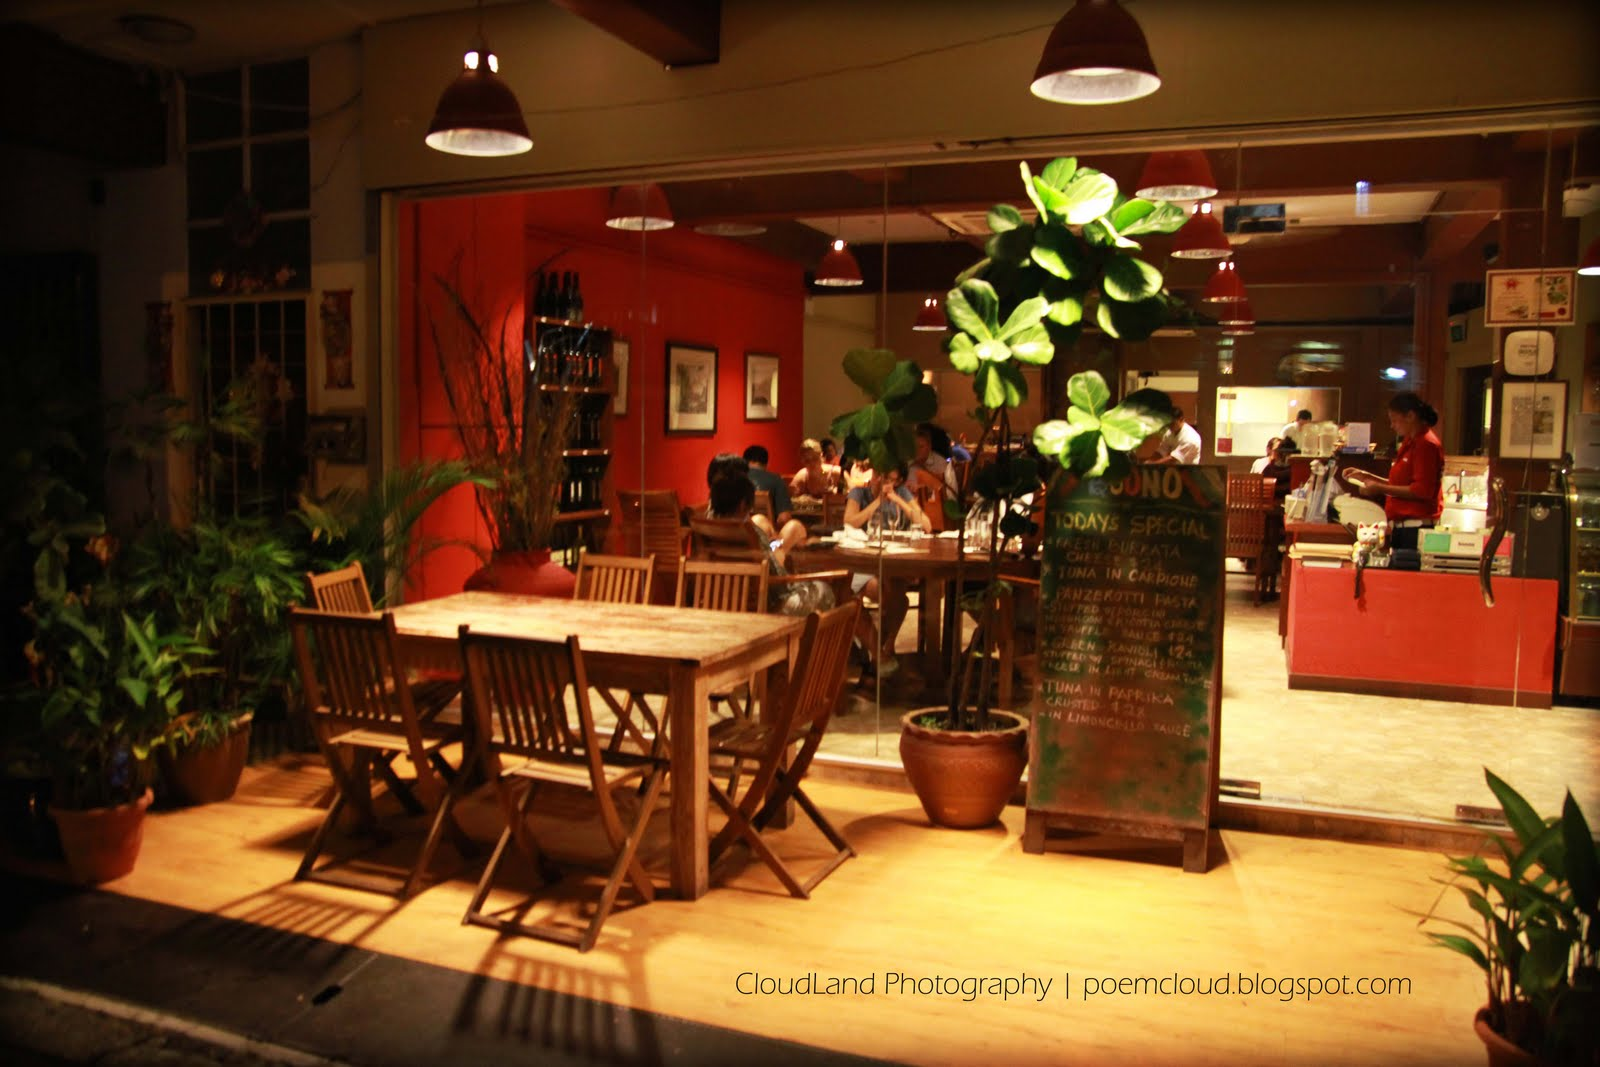 Cloudland buono pizza bar italian restaurant for Pizza restaurants